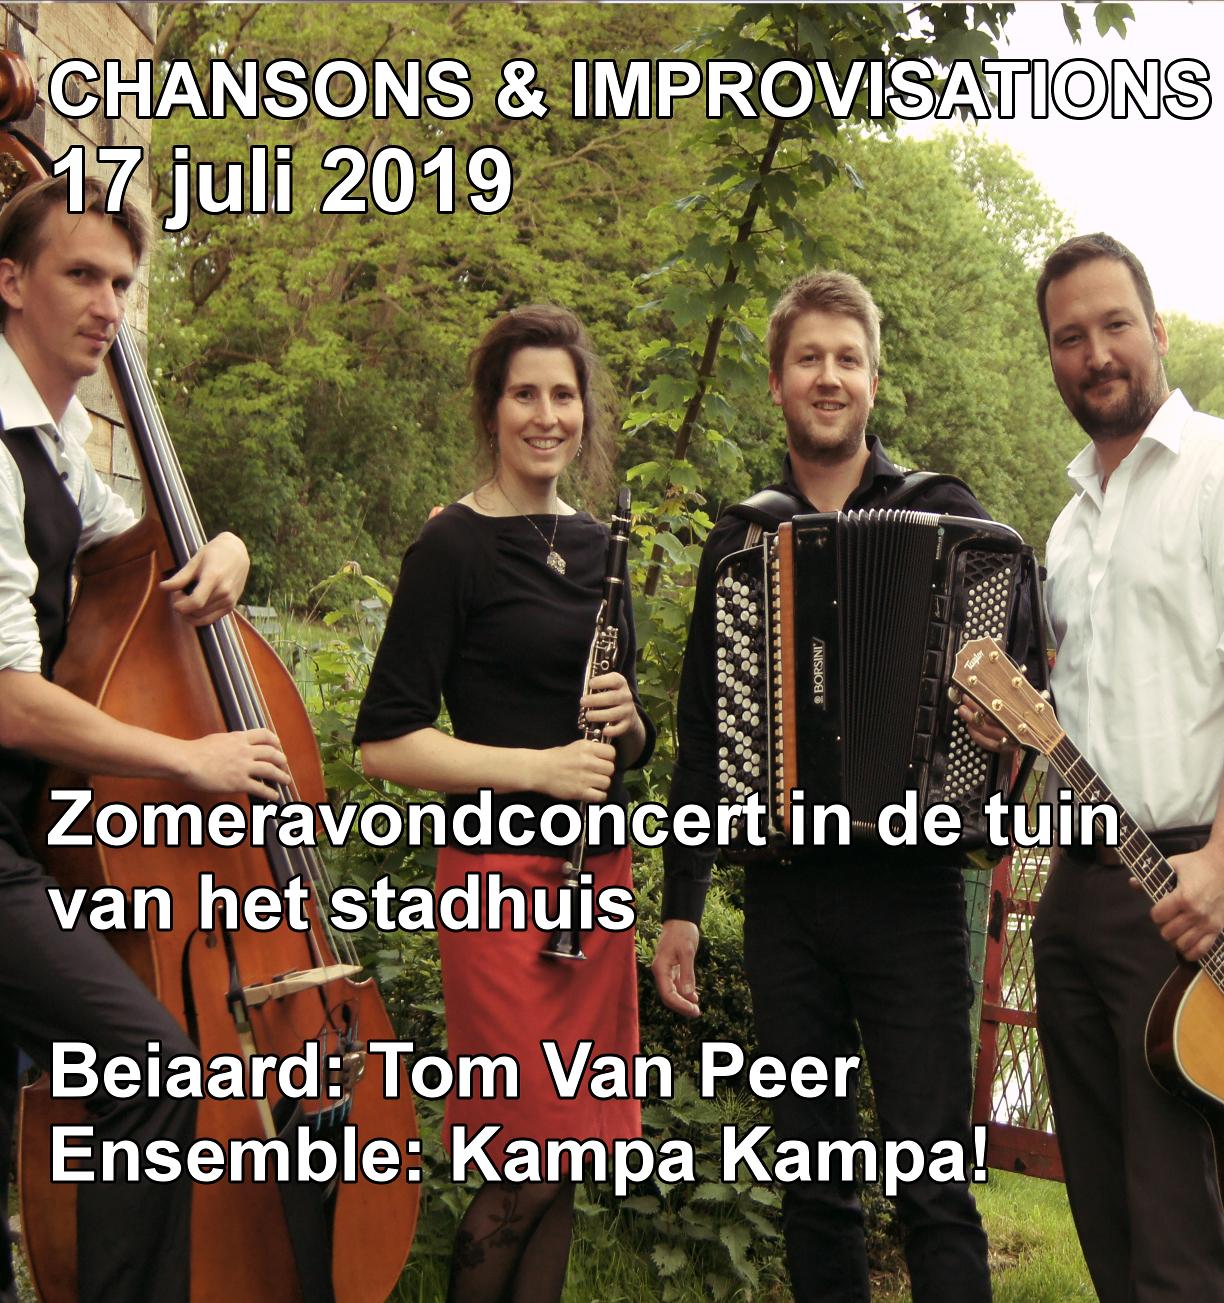 004 - Chansons & Improvisations.jpg